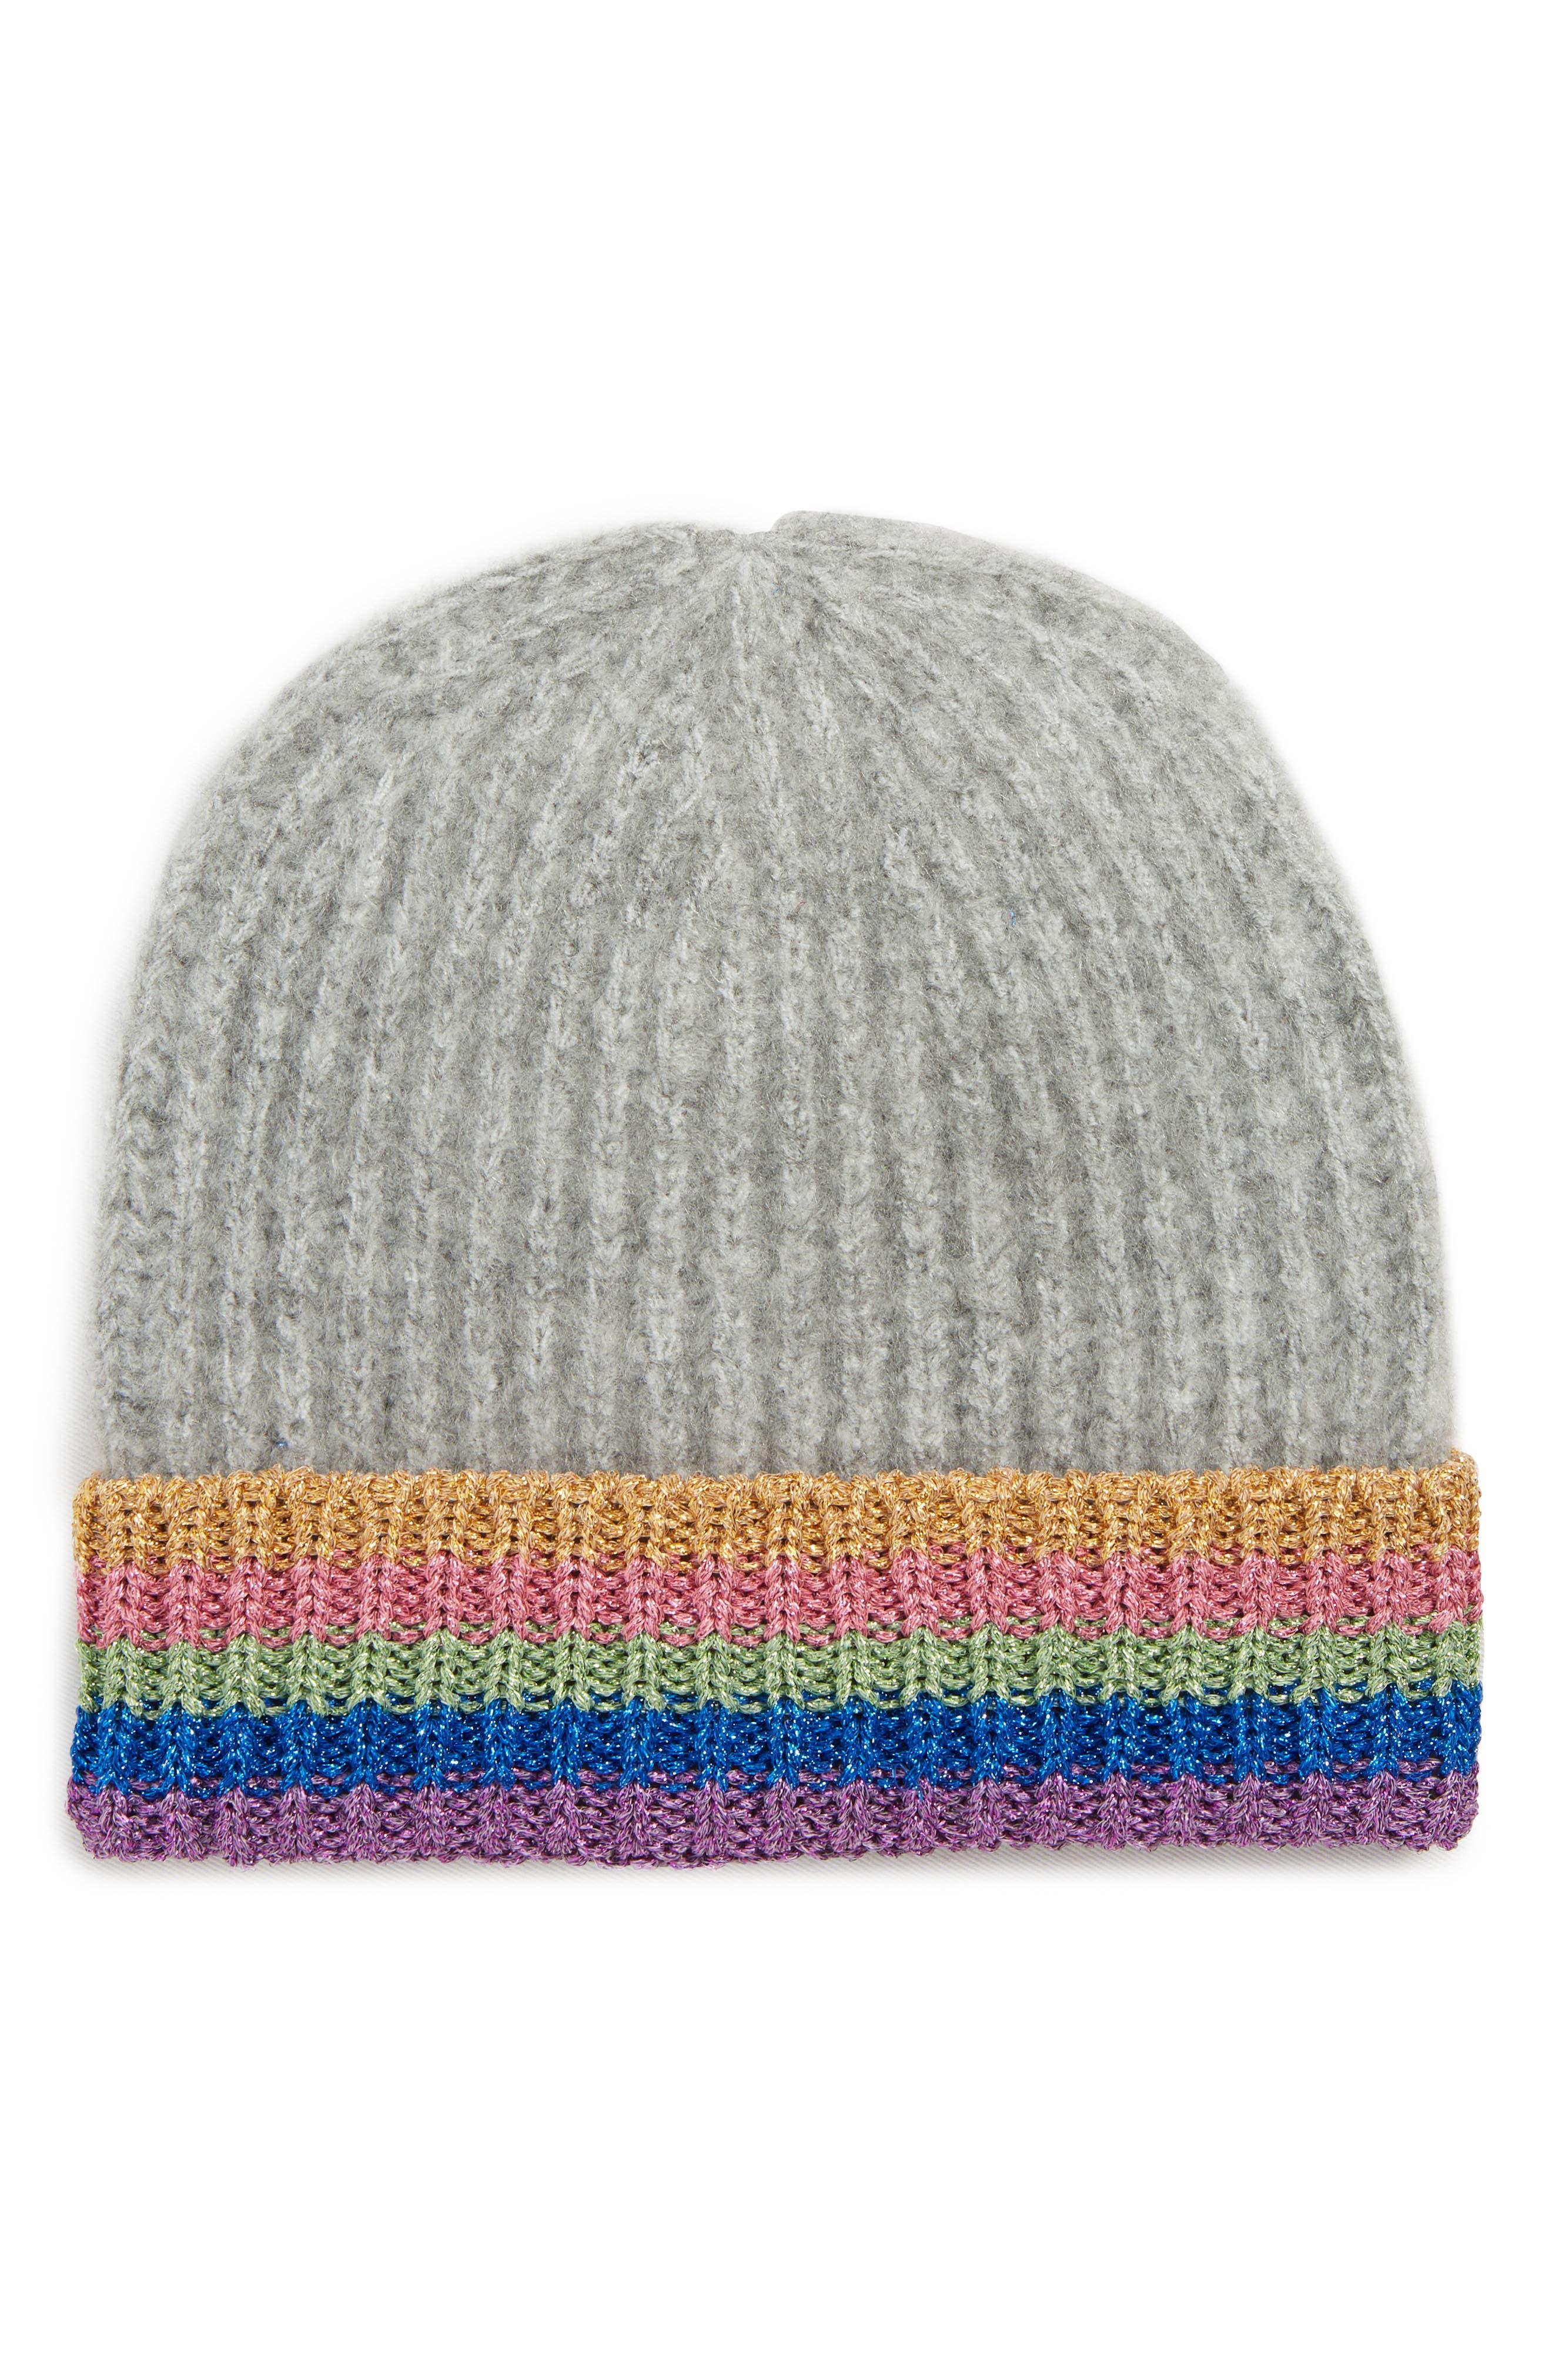 Rainbow Beanie Hat,                             Main thumbnail 1, color,                             GREY